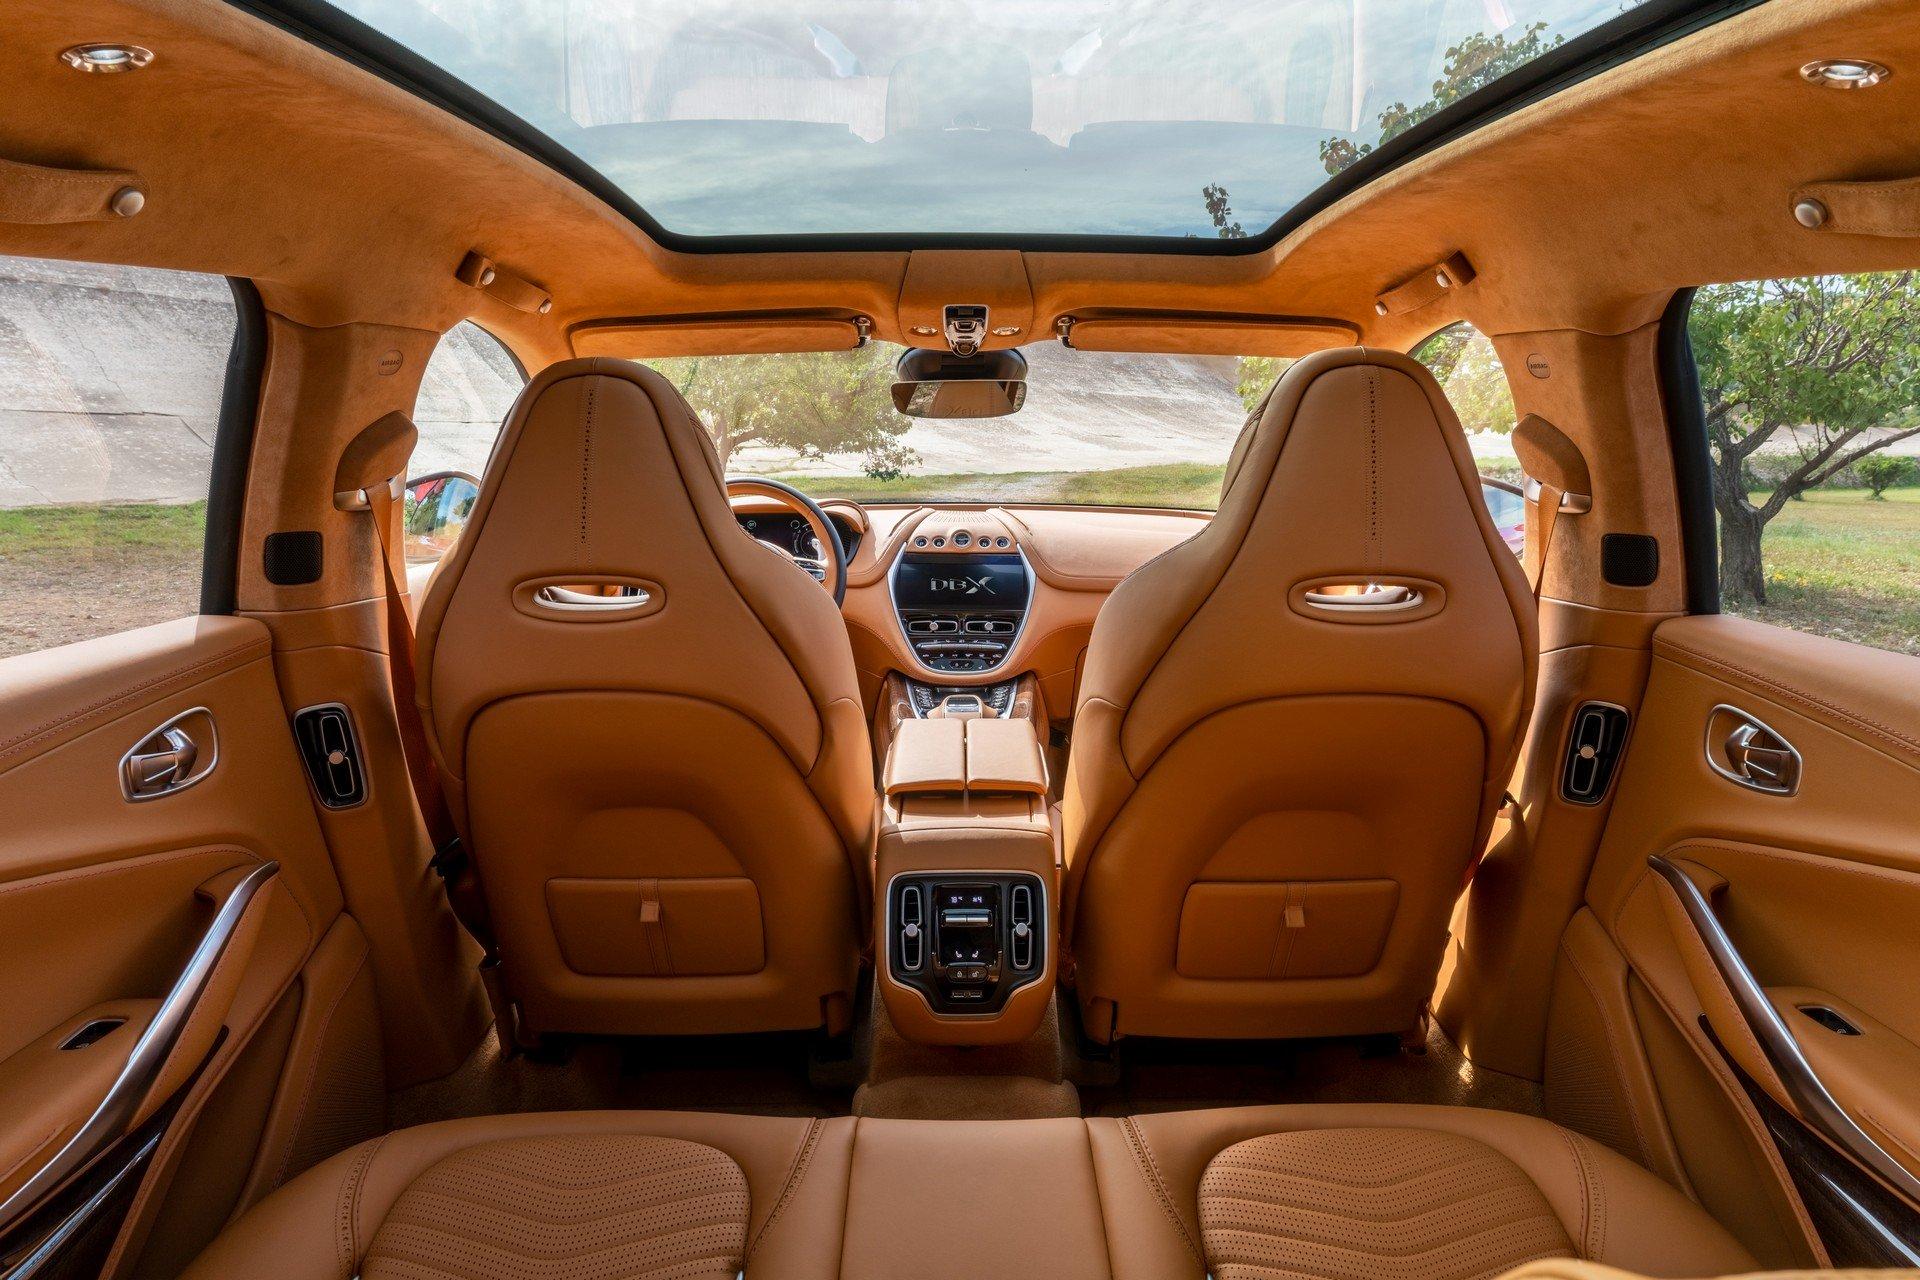 Aston Martin Dbx Suv 2020